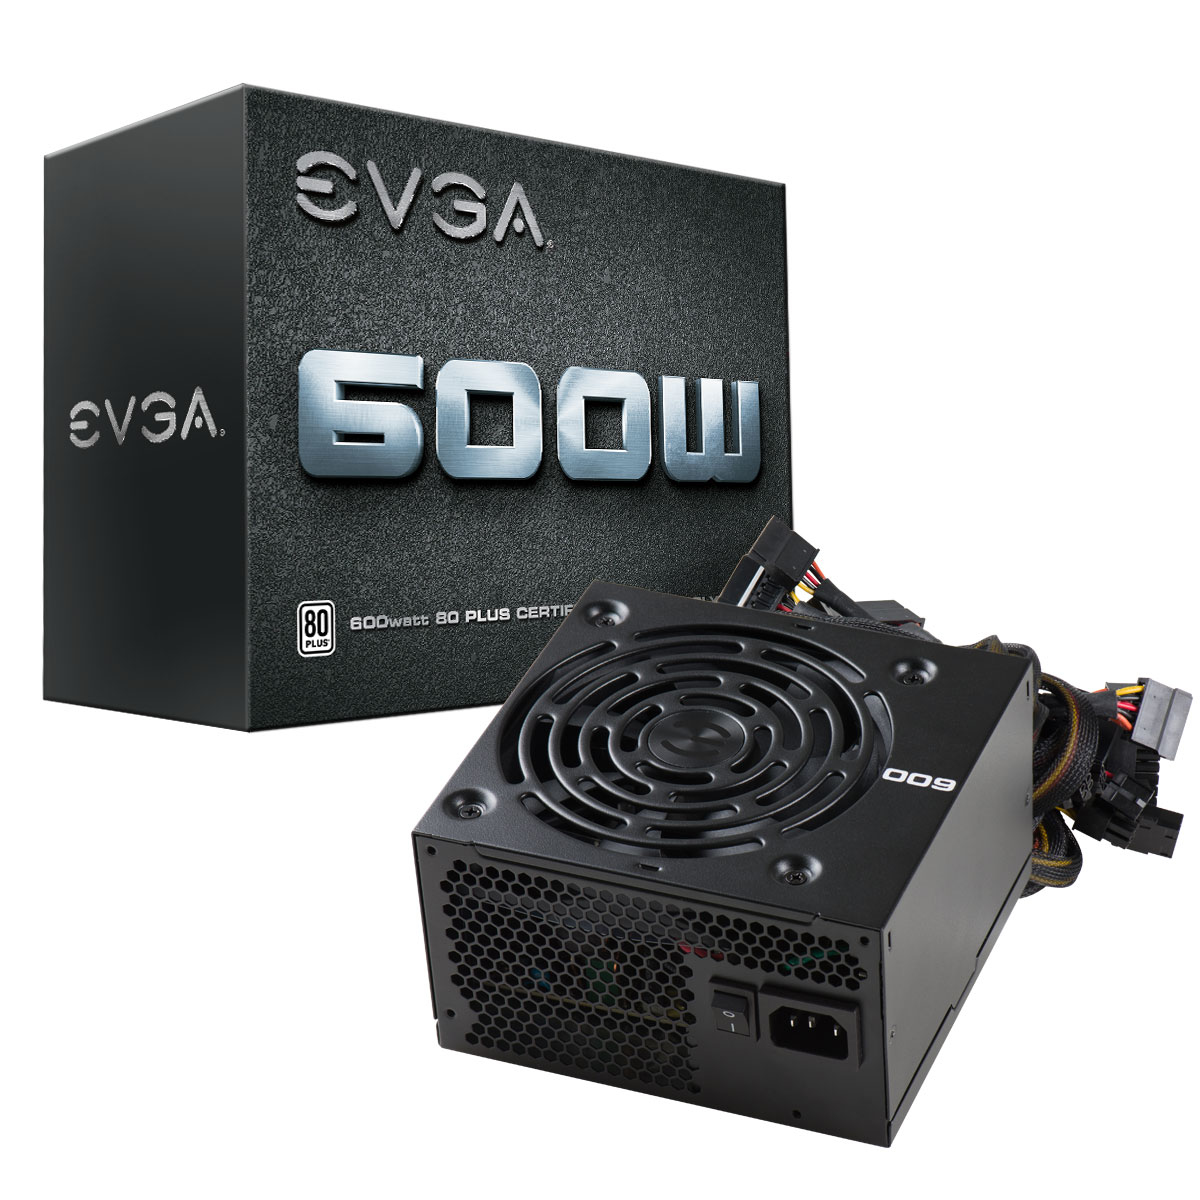 EVGA 600w WHITE 80+ PSU